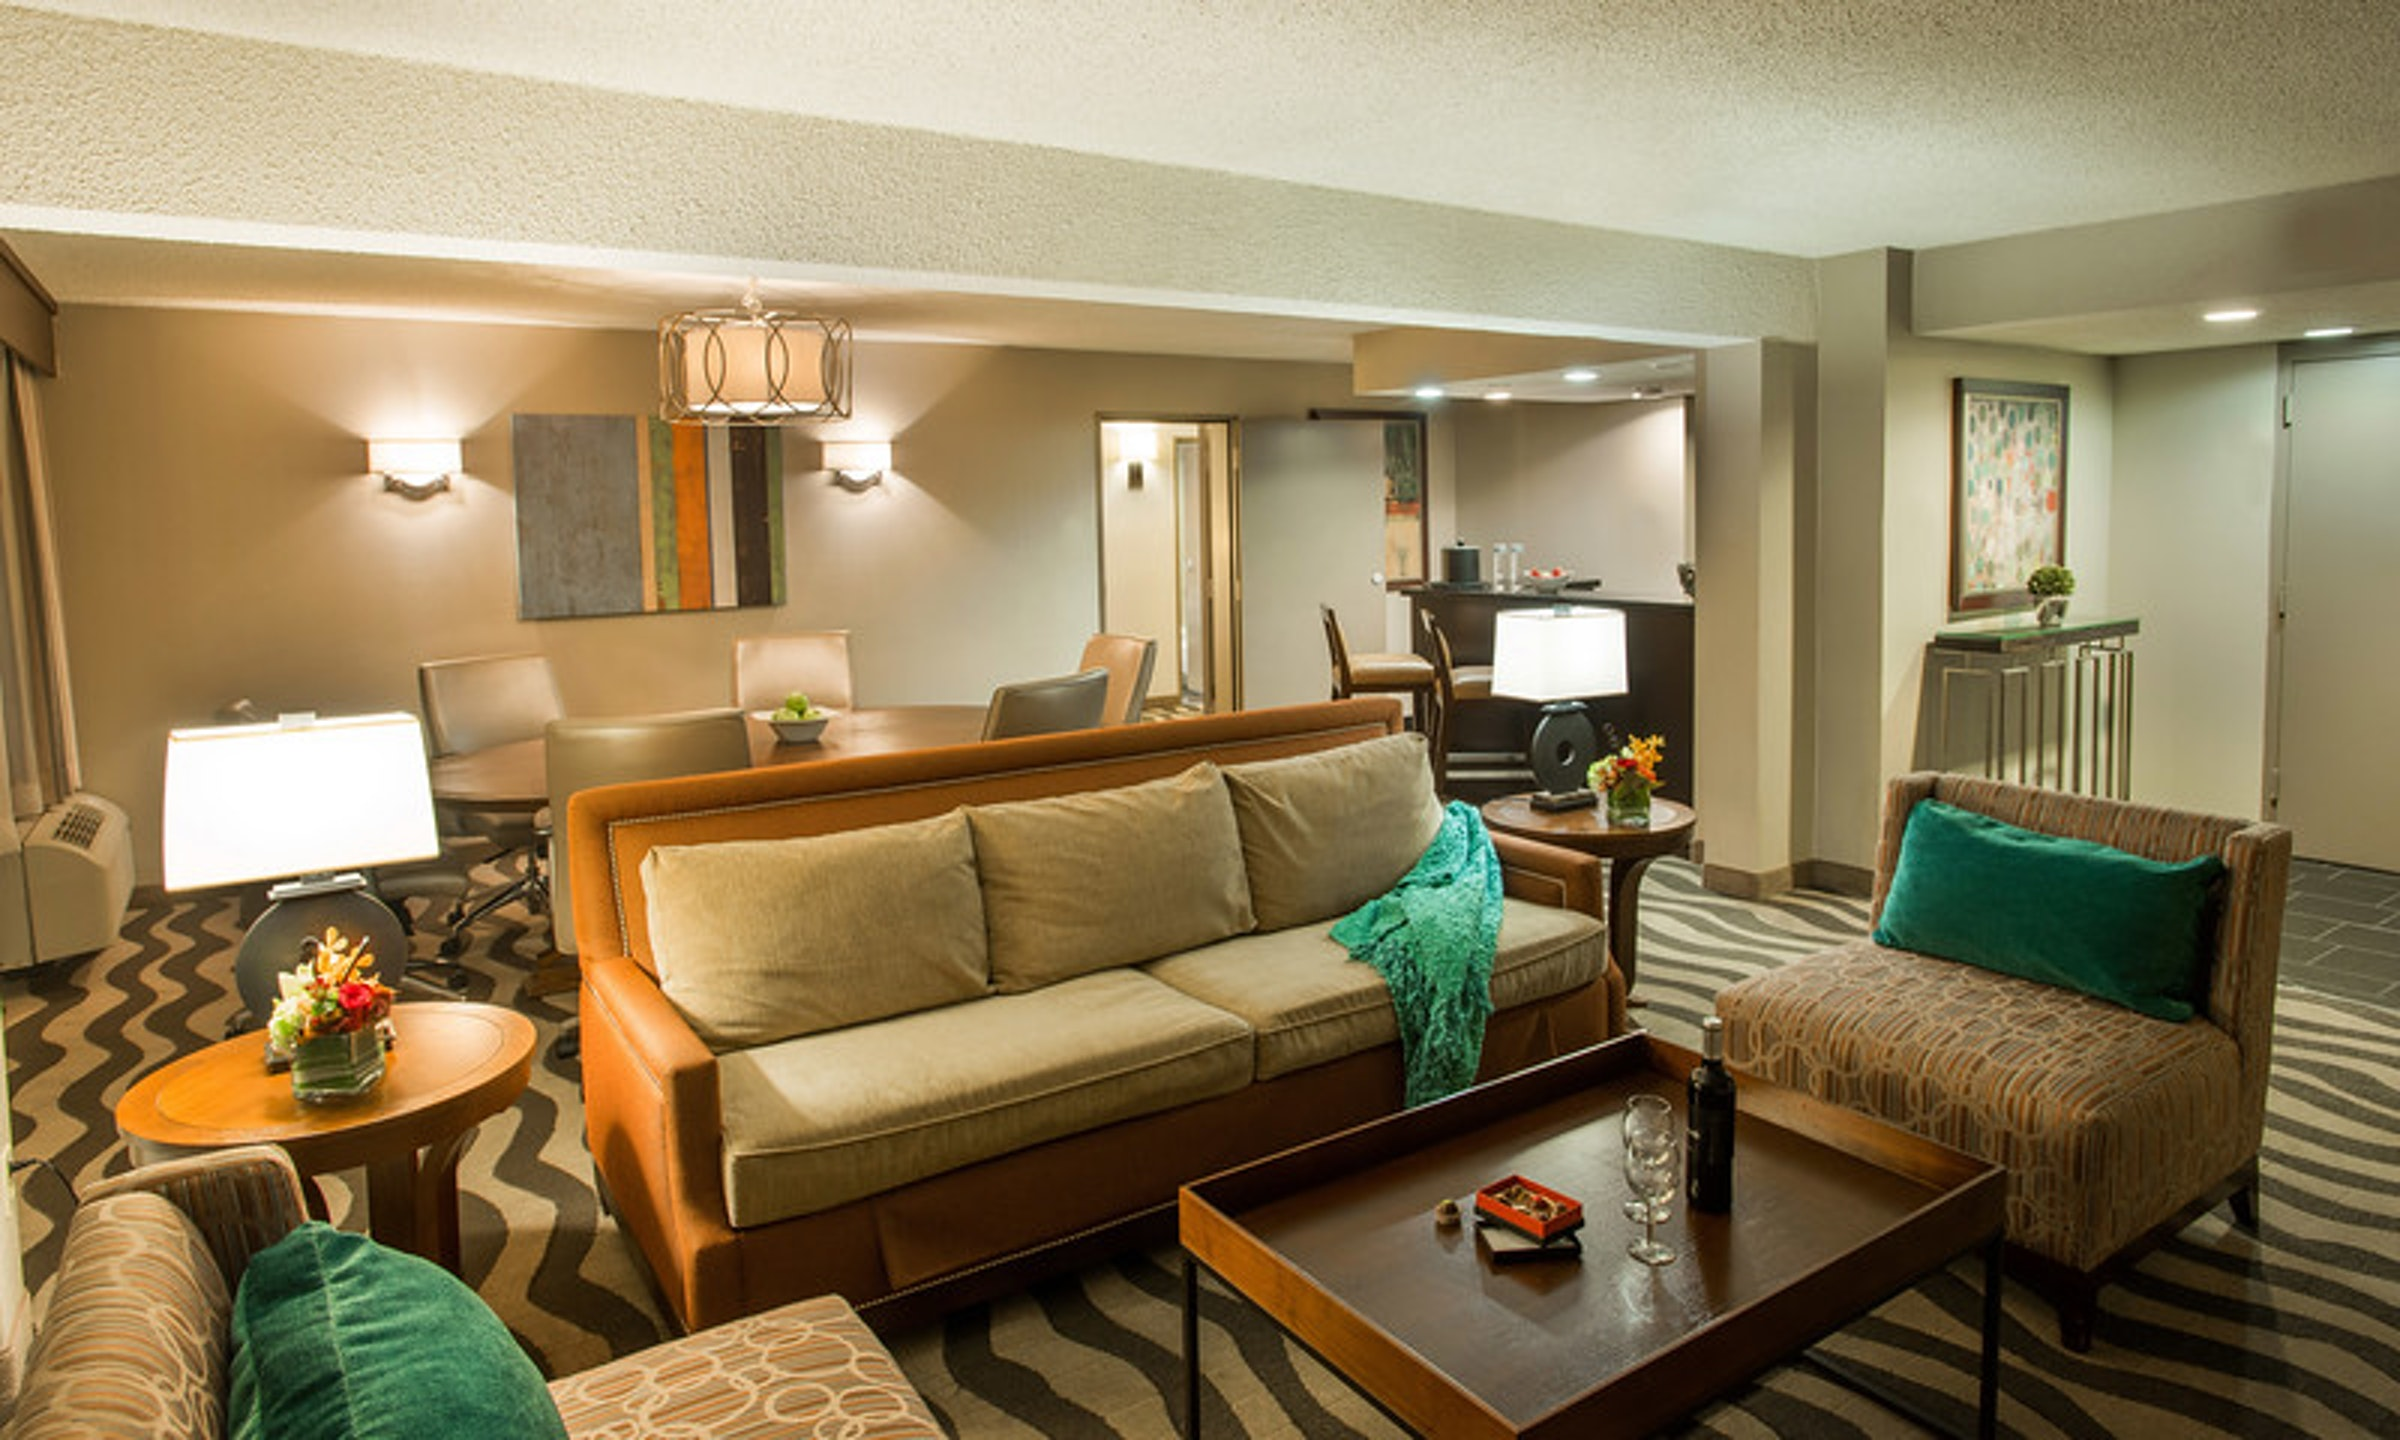 The Beeman Hotel in Beyond Dallas